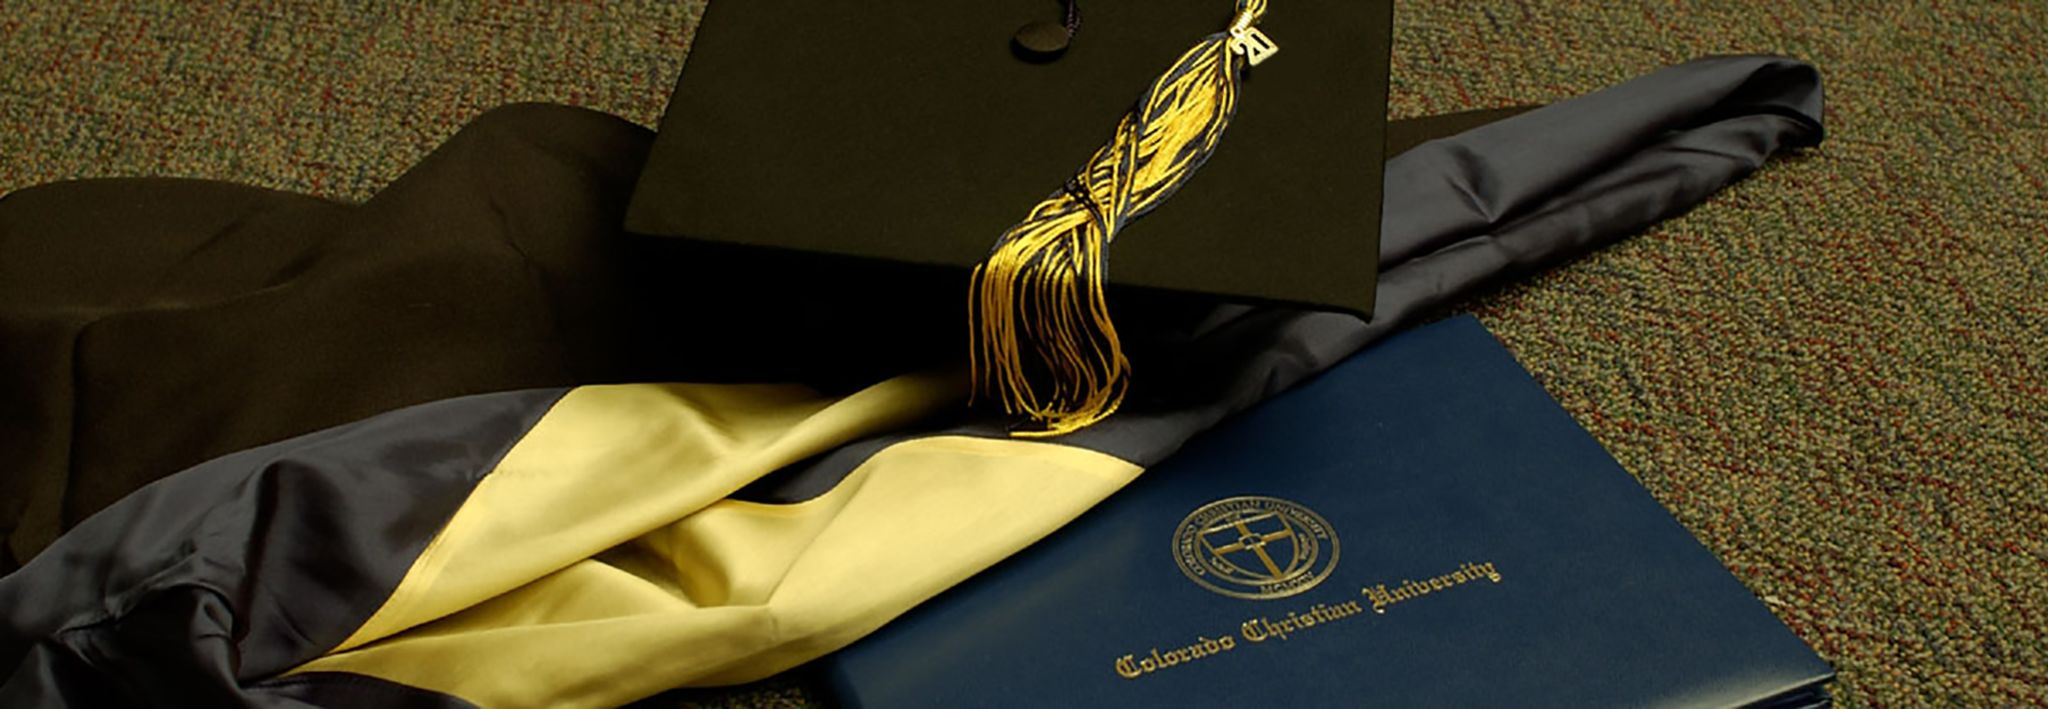 CCU cap, gown, and diploma.